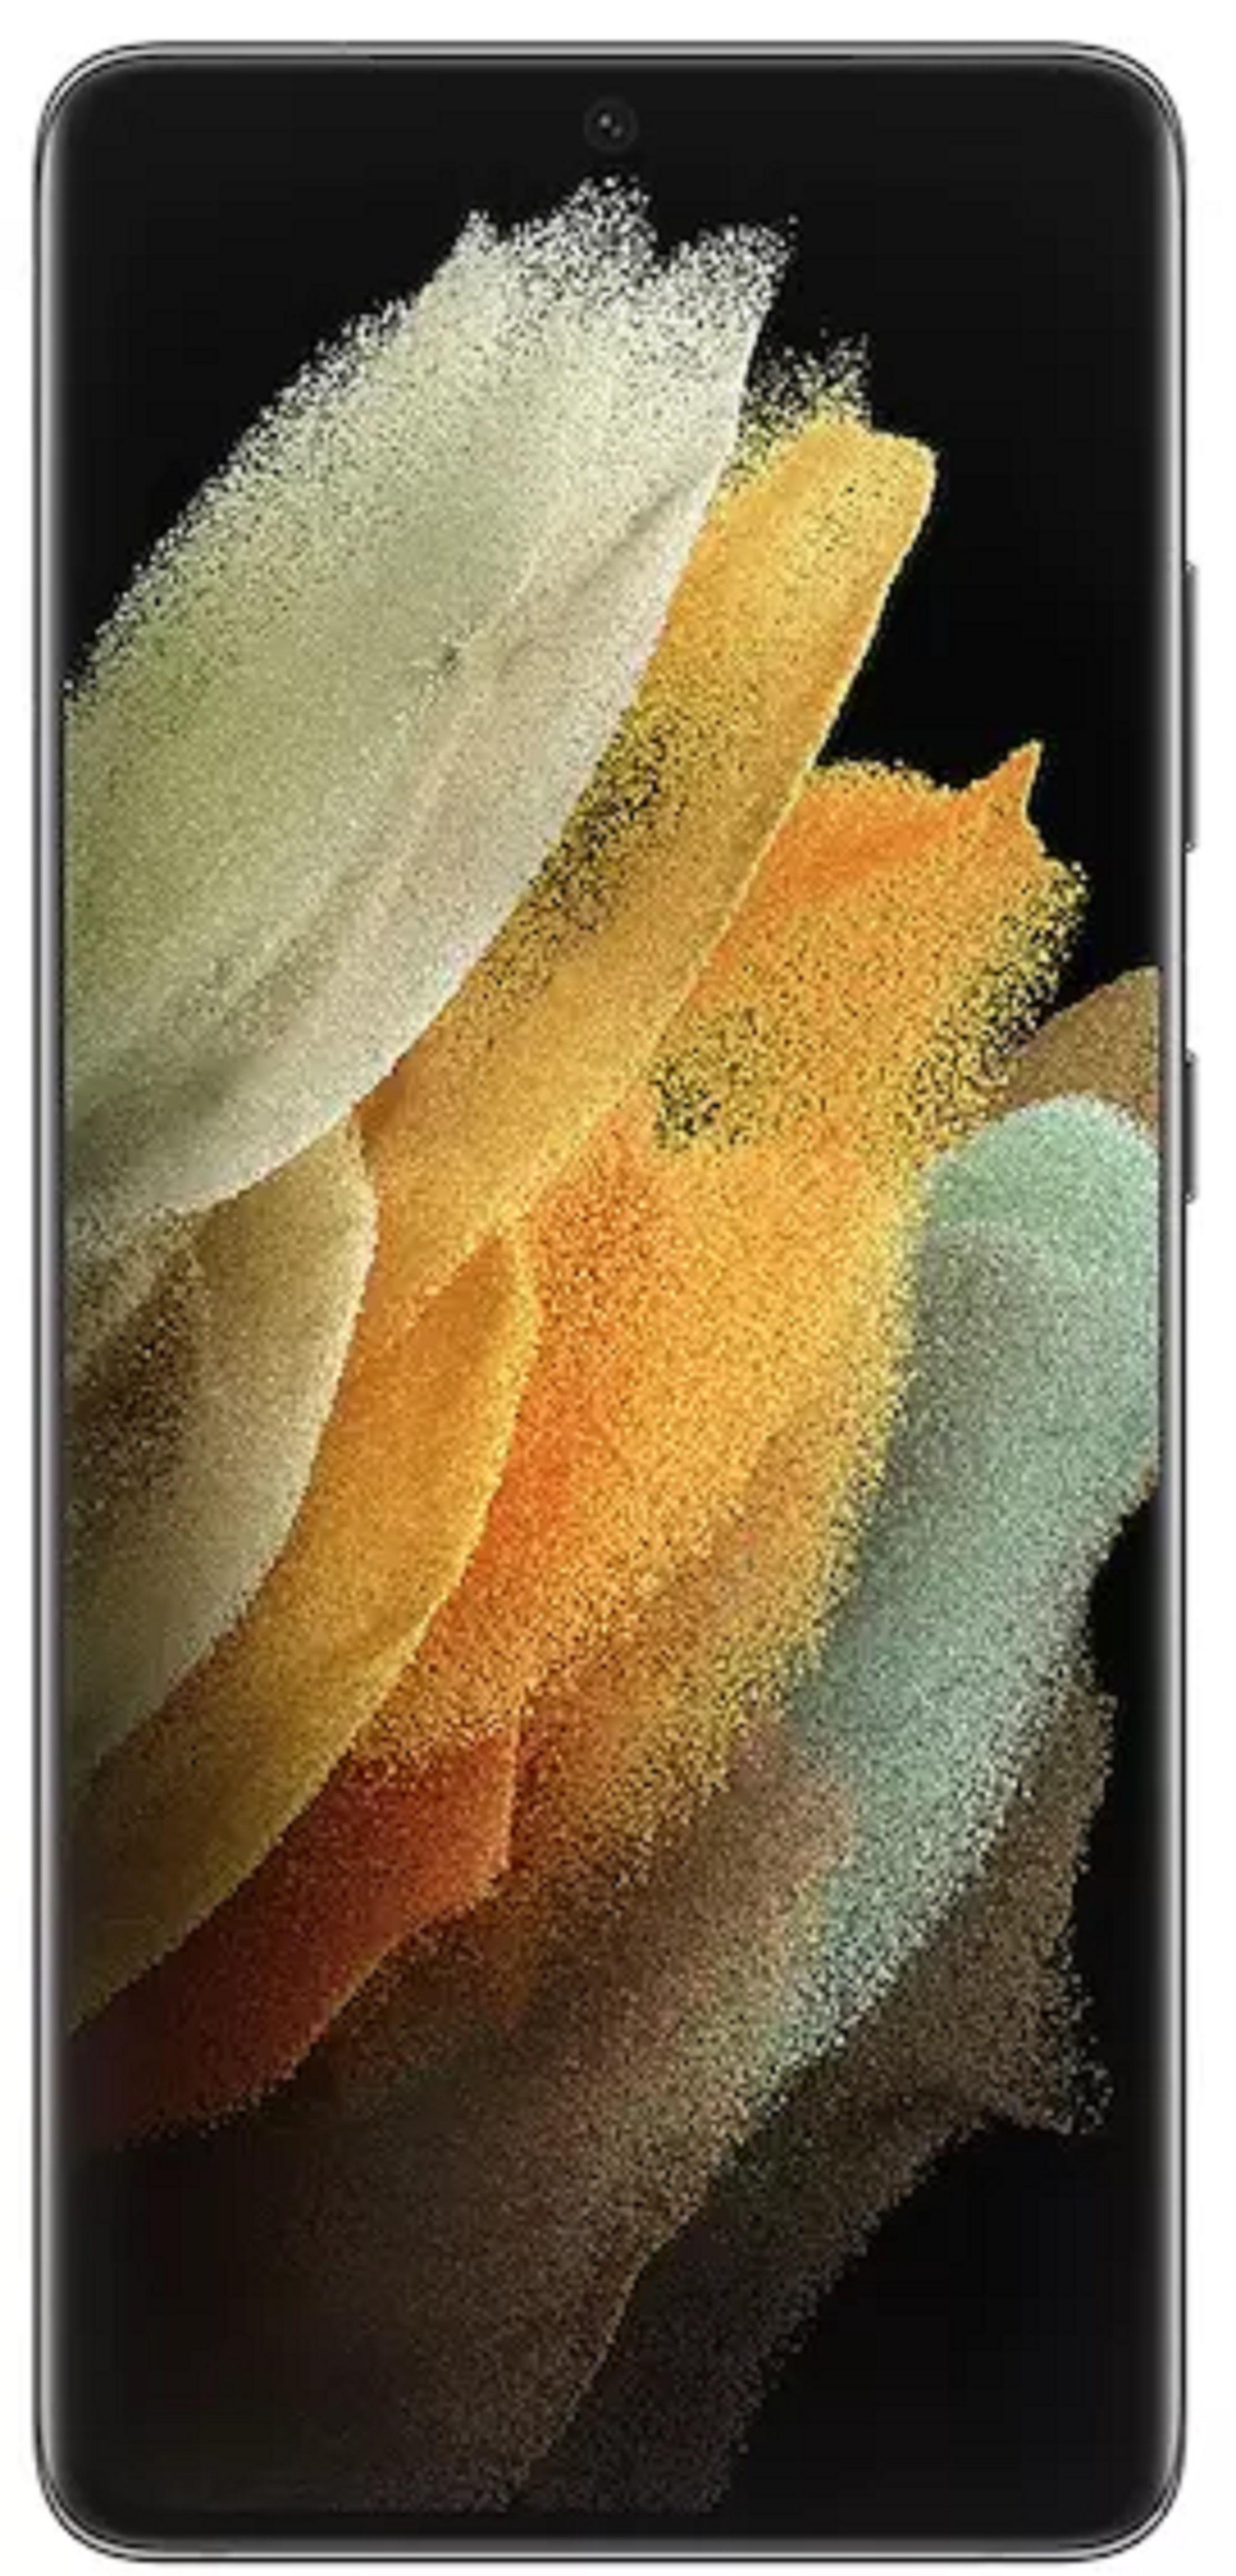 thumbnail 15 - Samsung Galaxy G998U S21 Ultra 5G 128GB Unlocked Smartphone - Excellent